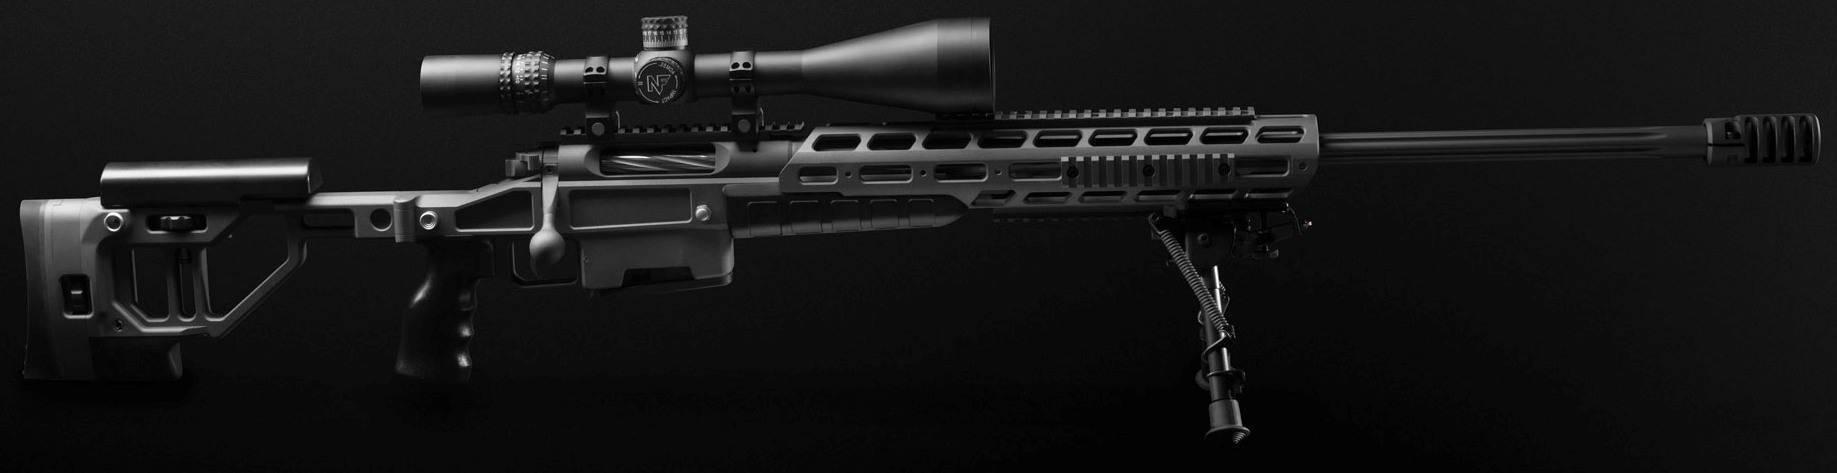 Снайперка из нержавейки. orsis t-5000